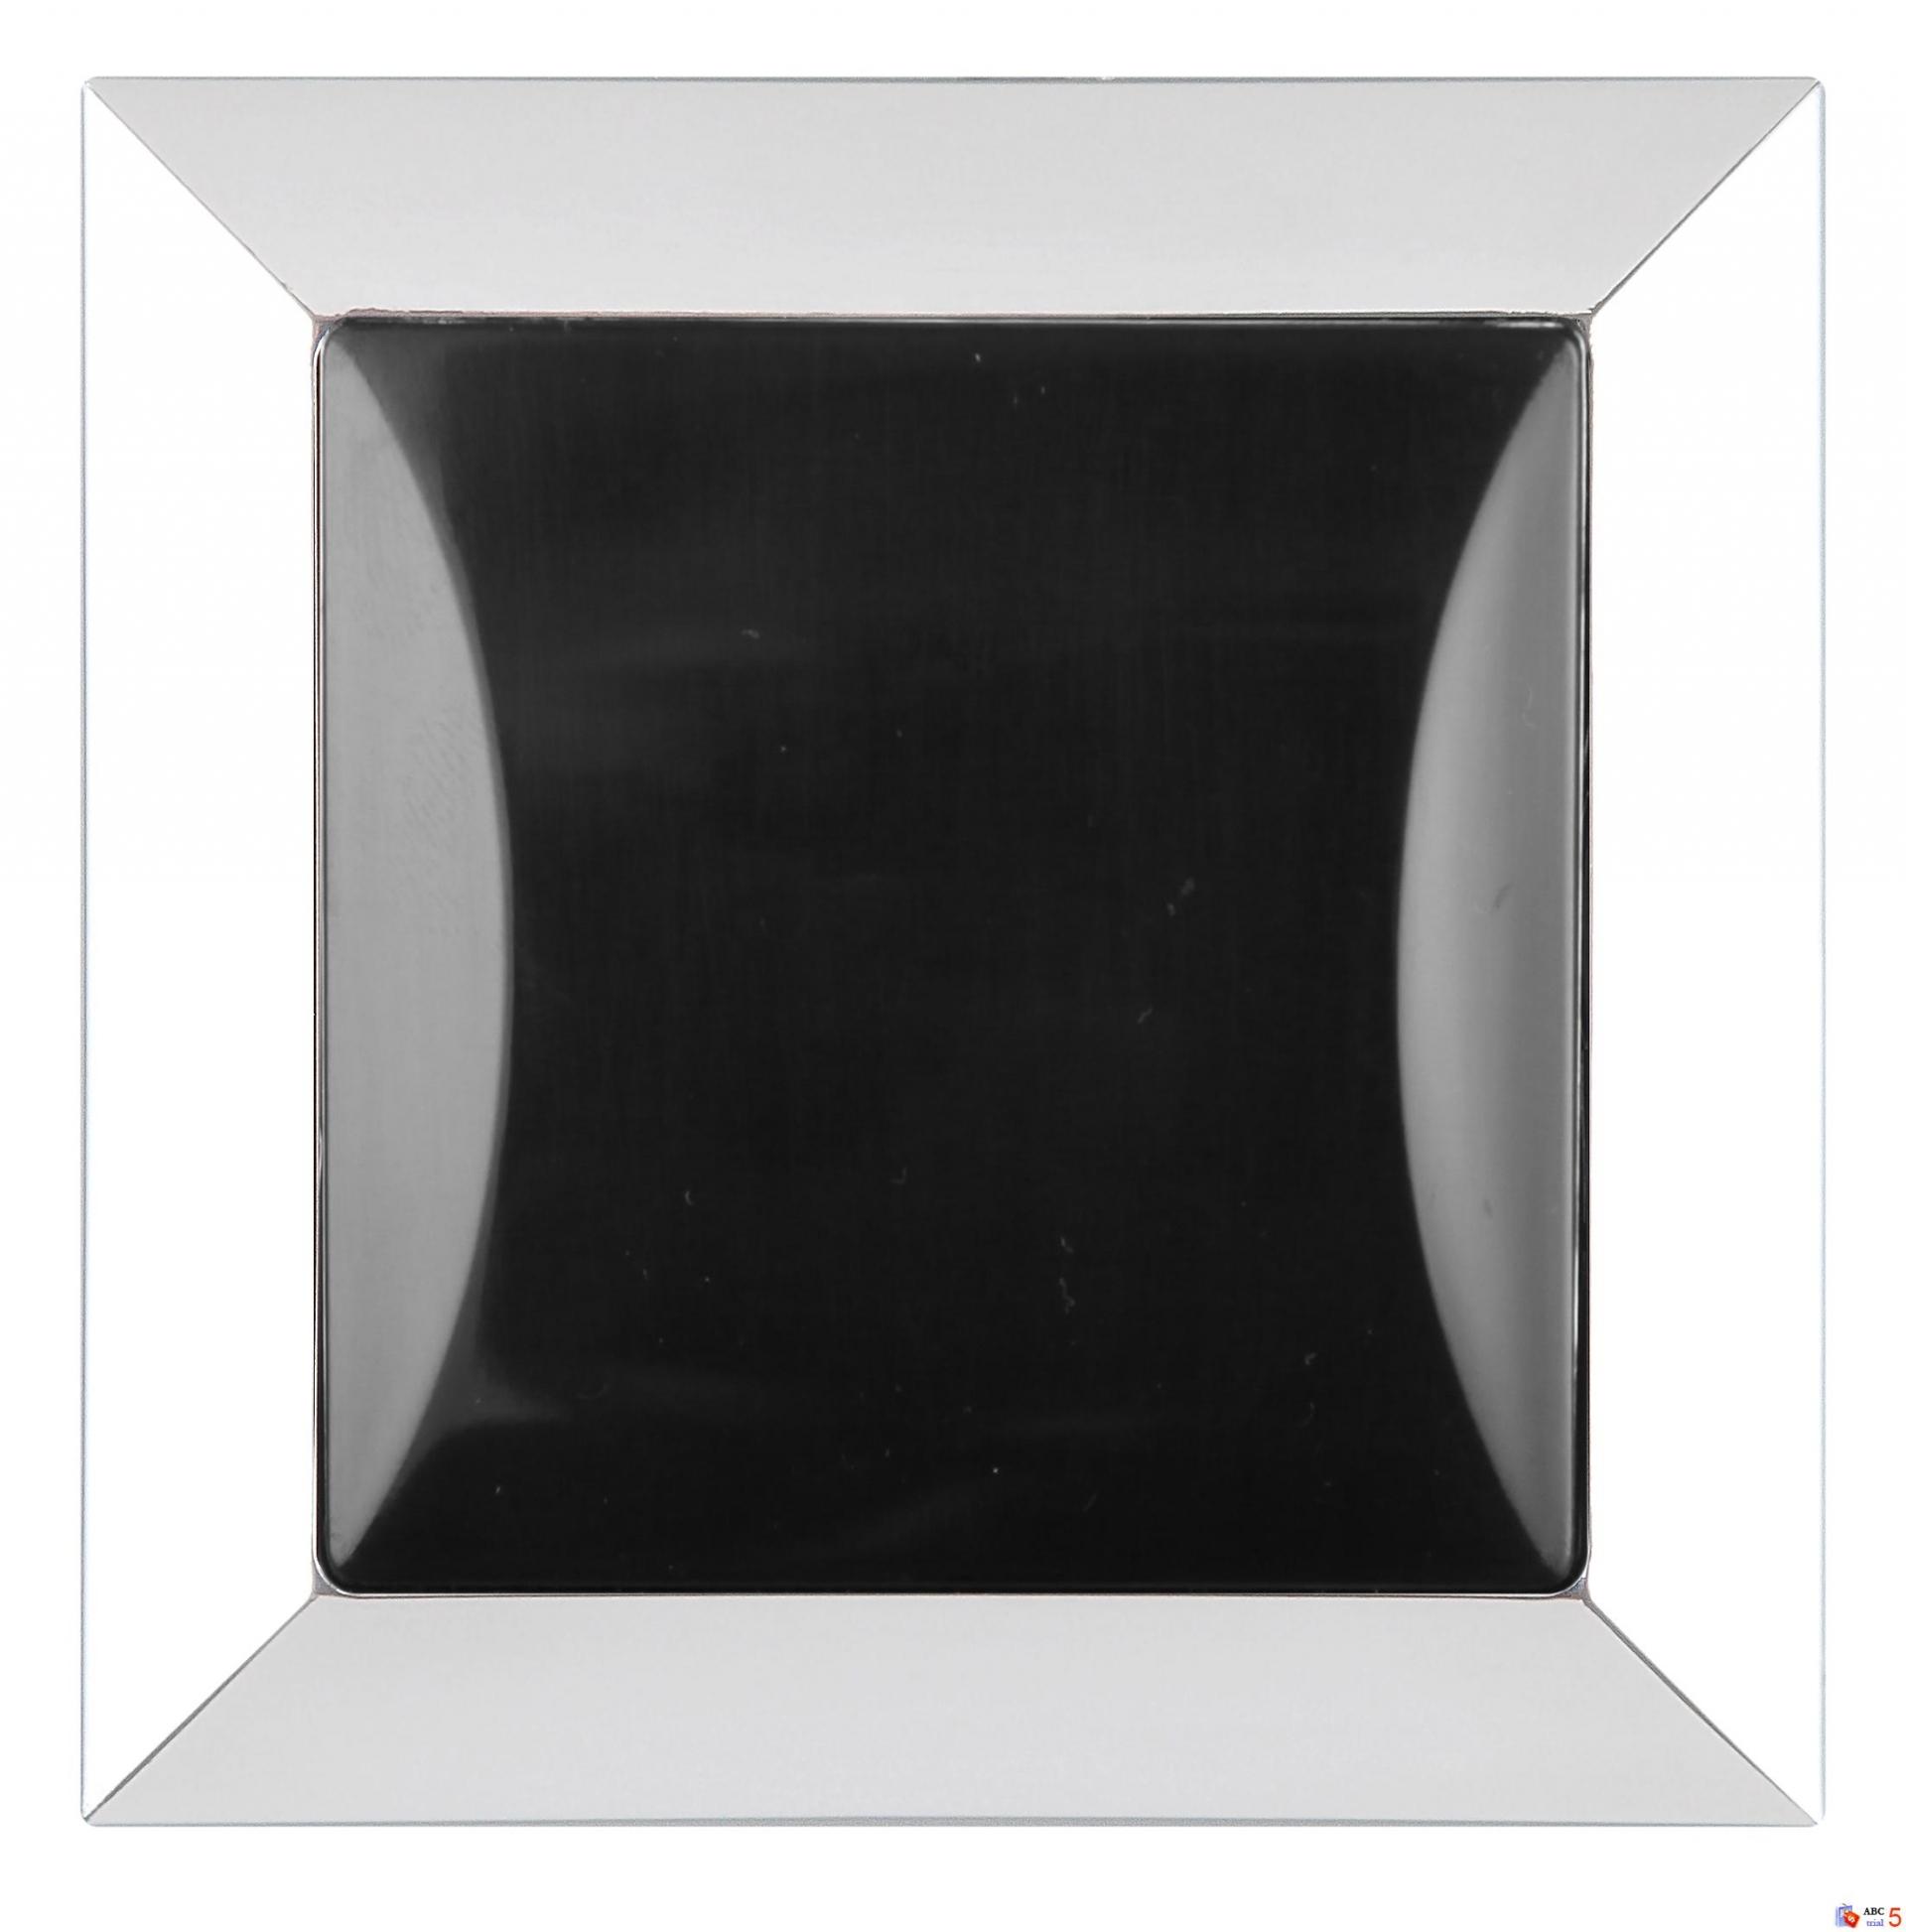 Tlačítkový ovládač  světlo chrom + černá